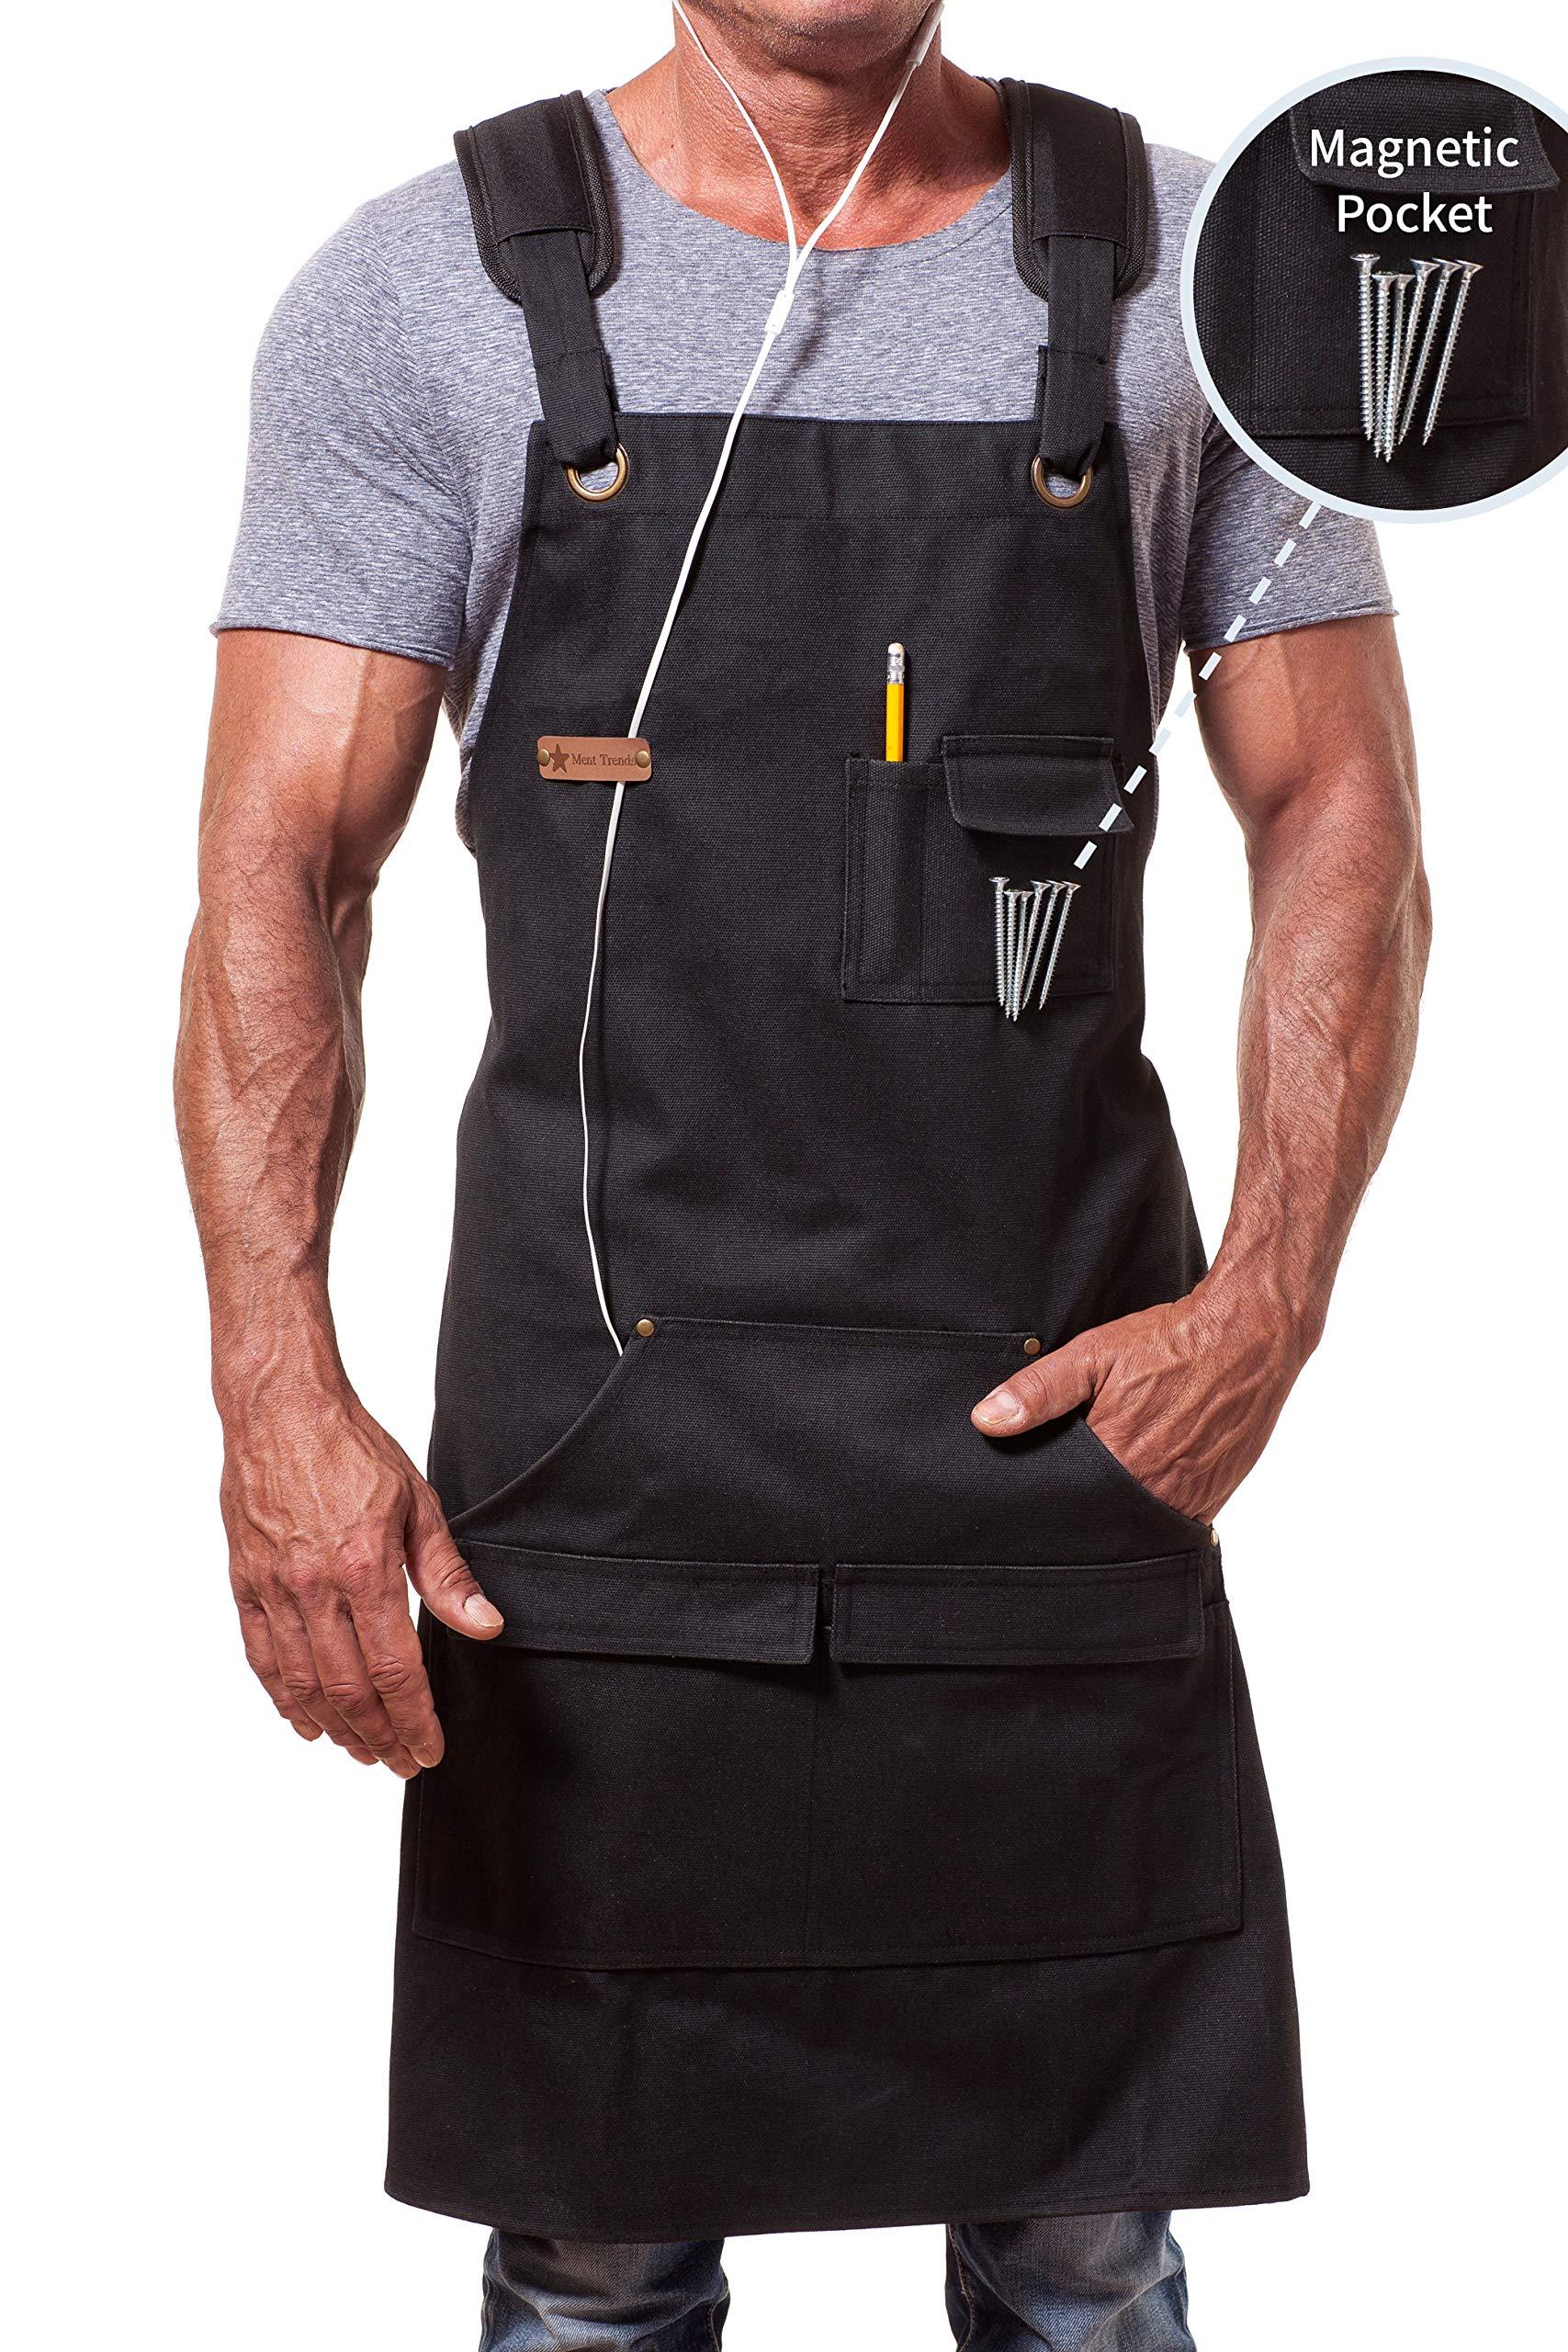 MENT Trends Work Apron For Men Women Heavy Duty Waxed Canvas Black Waterproof Shop Bib Adjustable M to XXL; Magnetic Pocket + Quick Release Buckle + Dual Tool Loops + Headphones Loop + Padded Straps by ARAWAK BRAVE